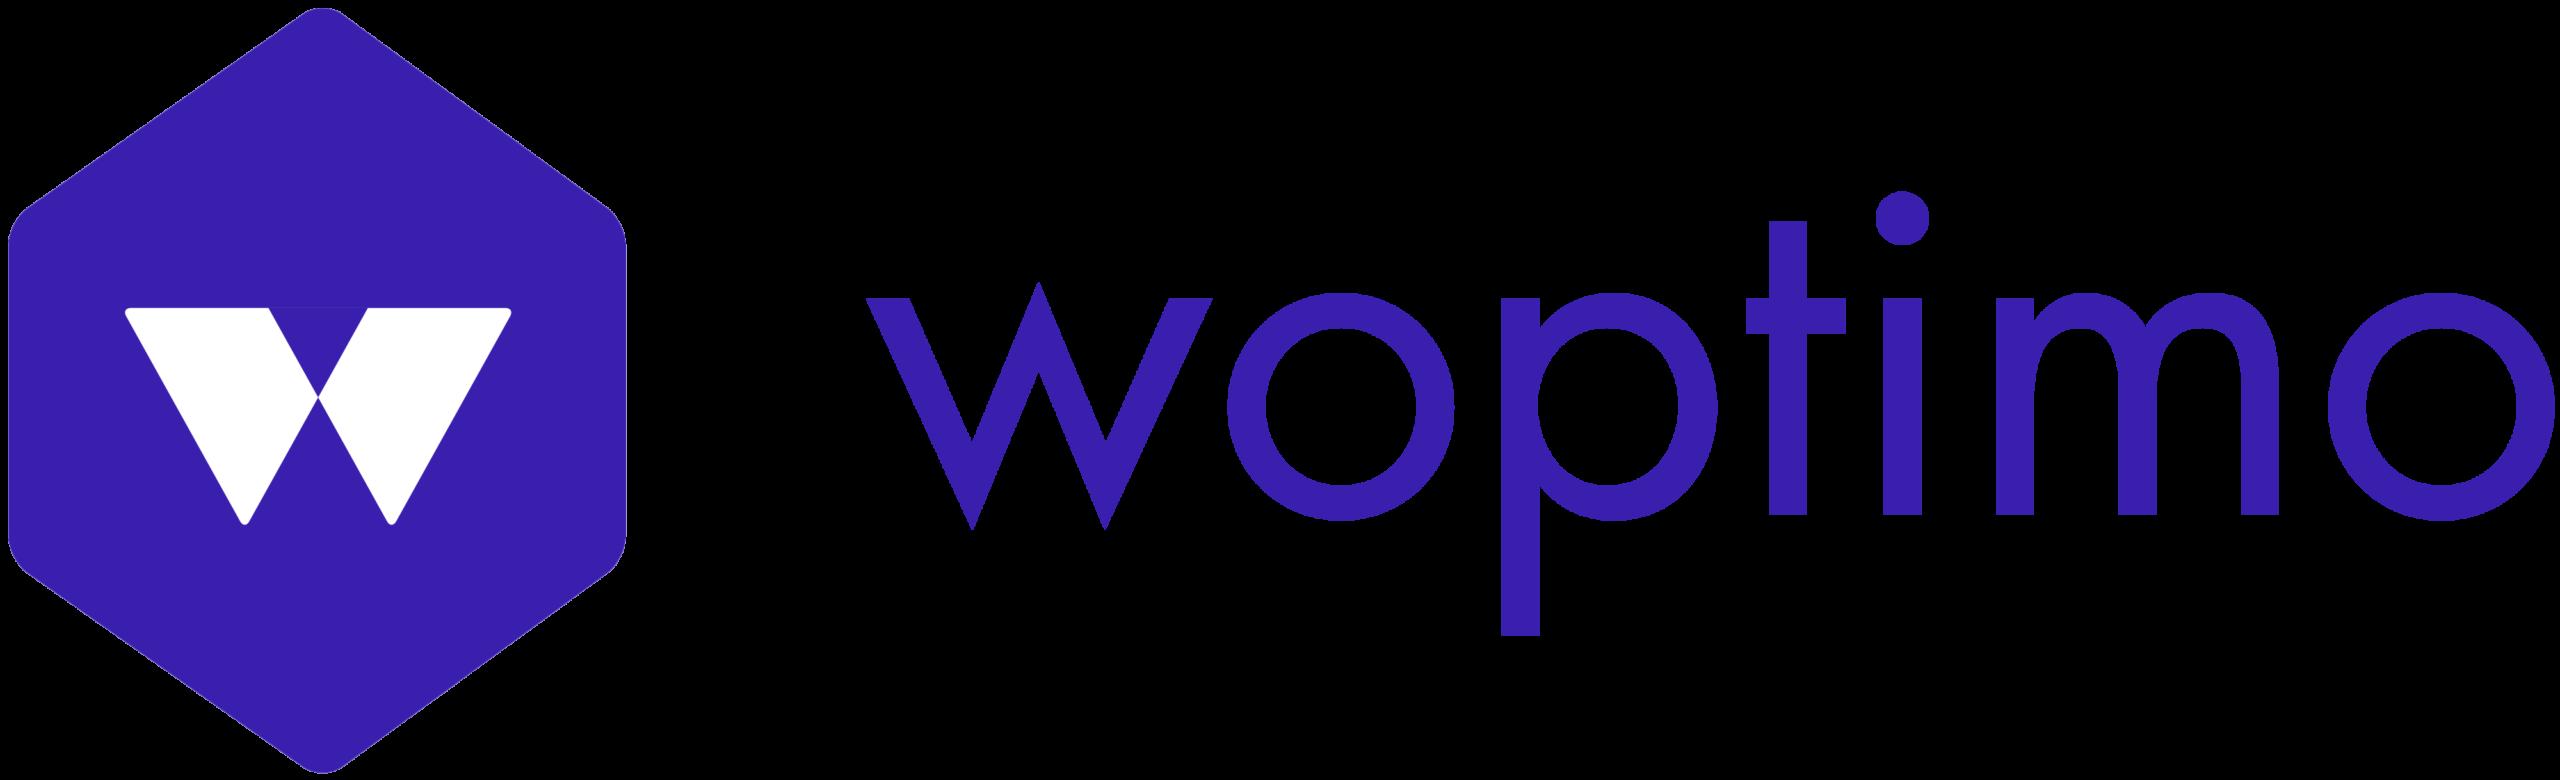 woptimo logo violet très grande taille (1)